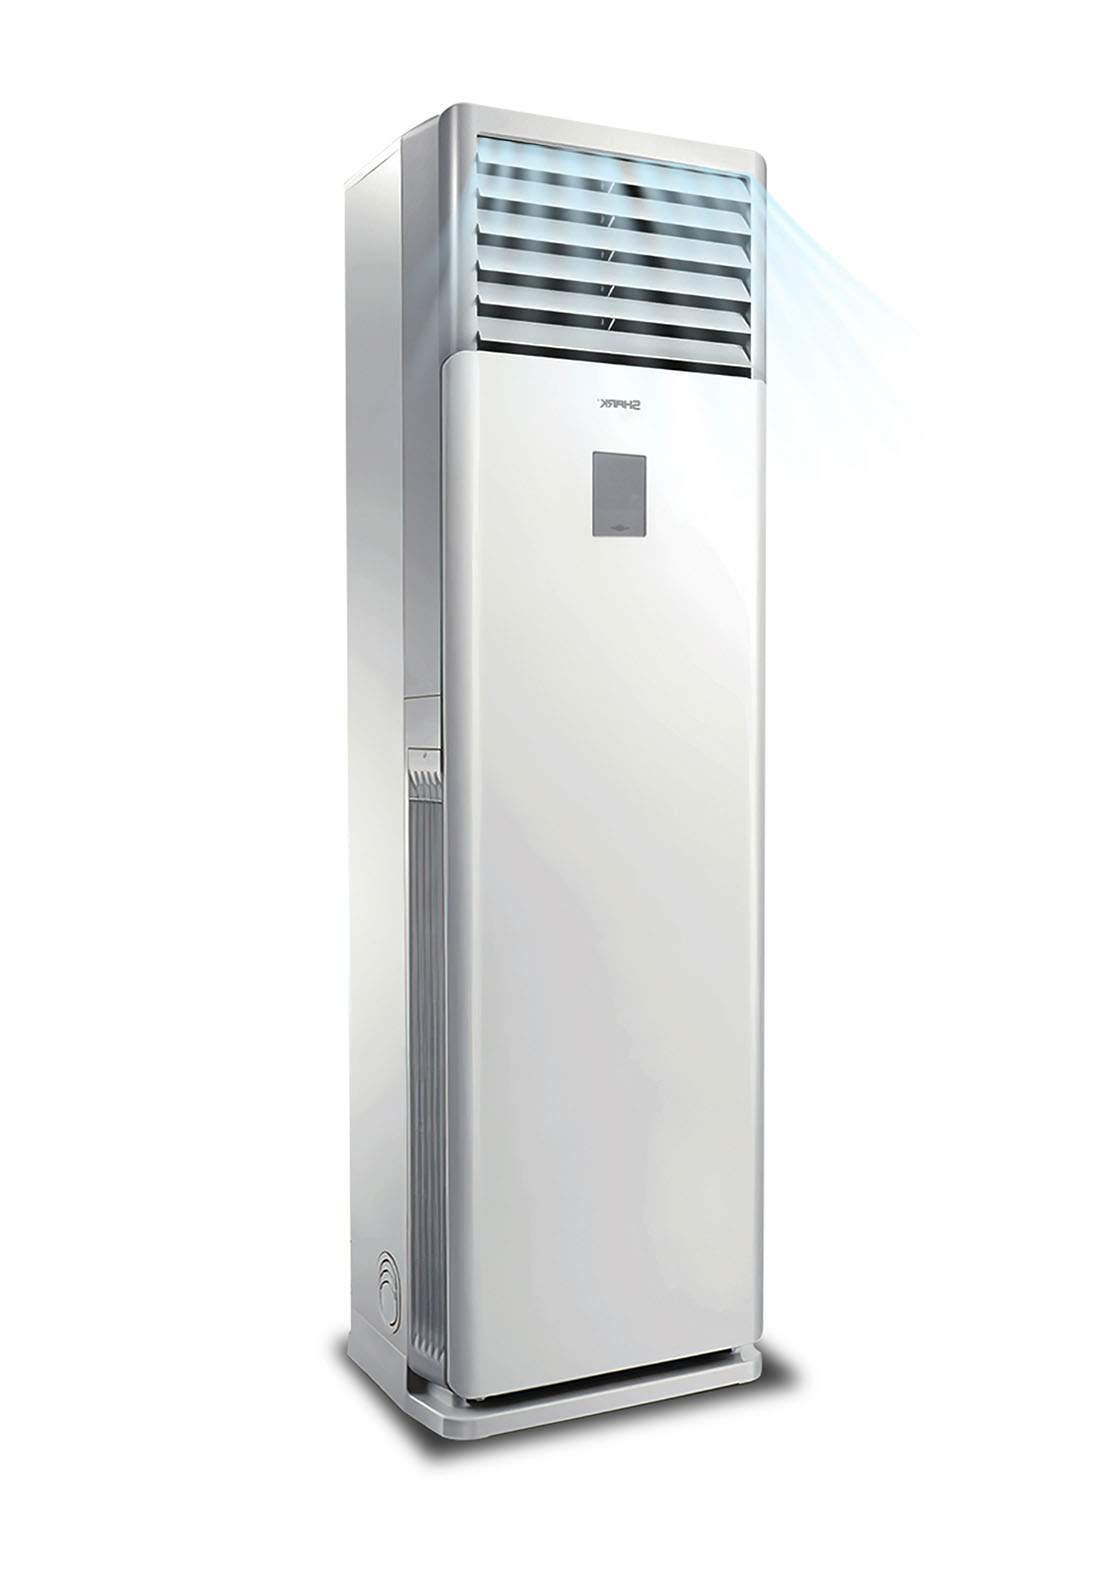 Shark Split Vertical Air Conditioner 5 Ton سبلت عمودي 5 طن